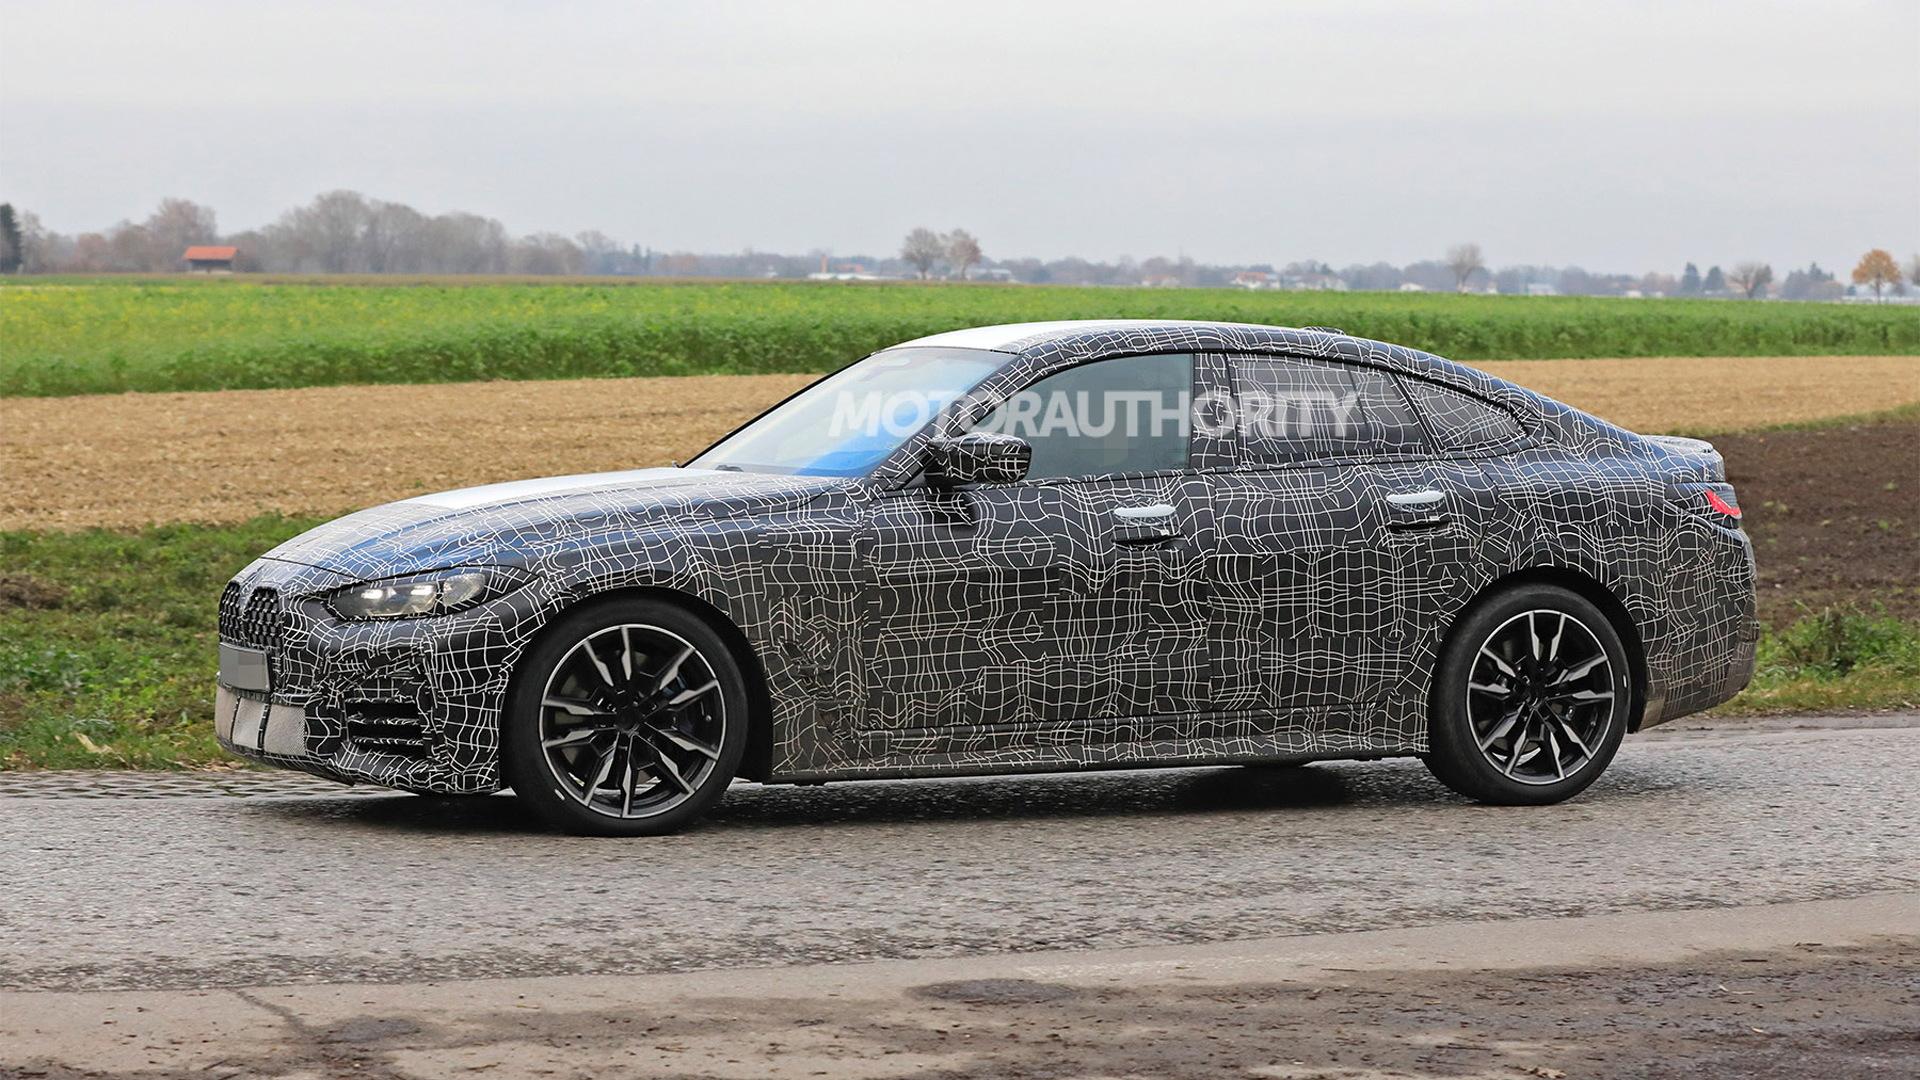 2022 BMW 4-Series Gran Coupe spy shots - Photo credit:S. Baldauf/SB-Medien